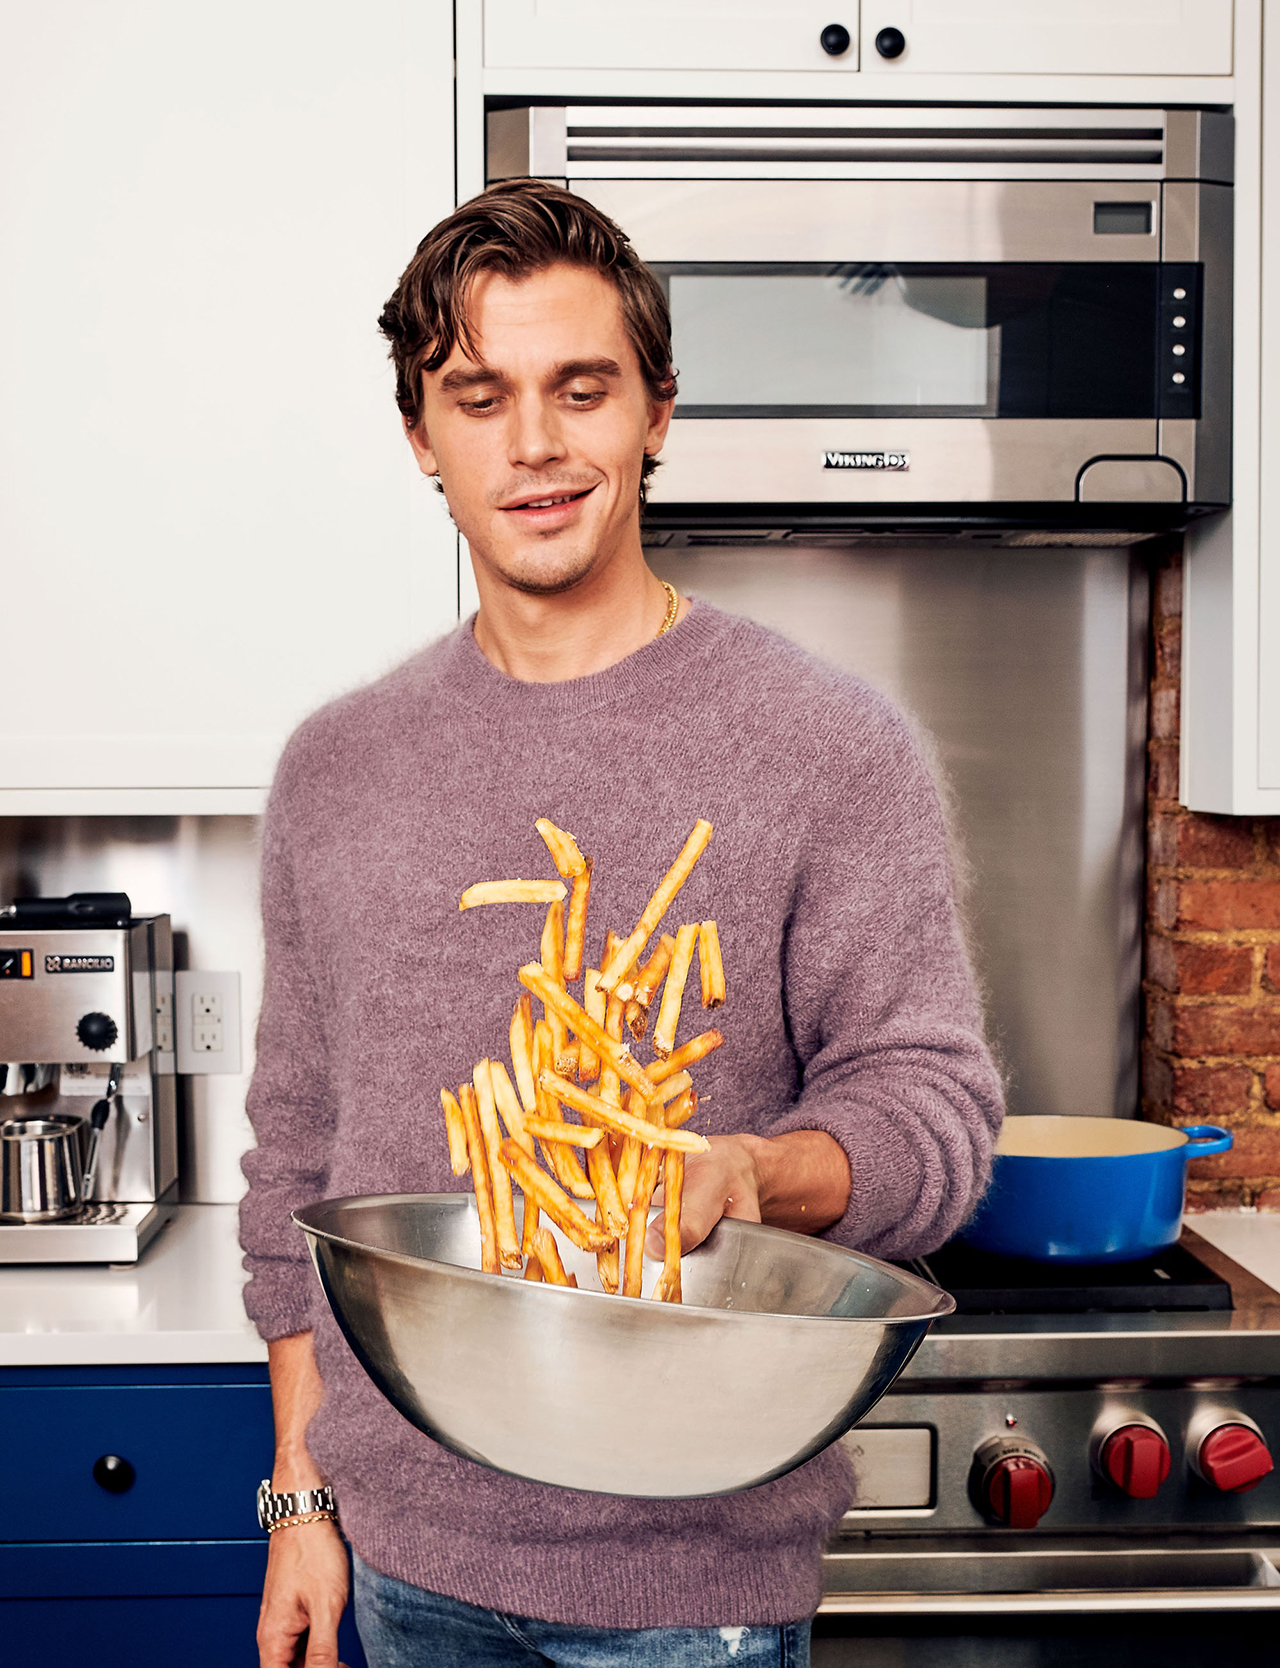 antoni tossing fries in bowl